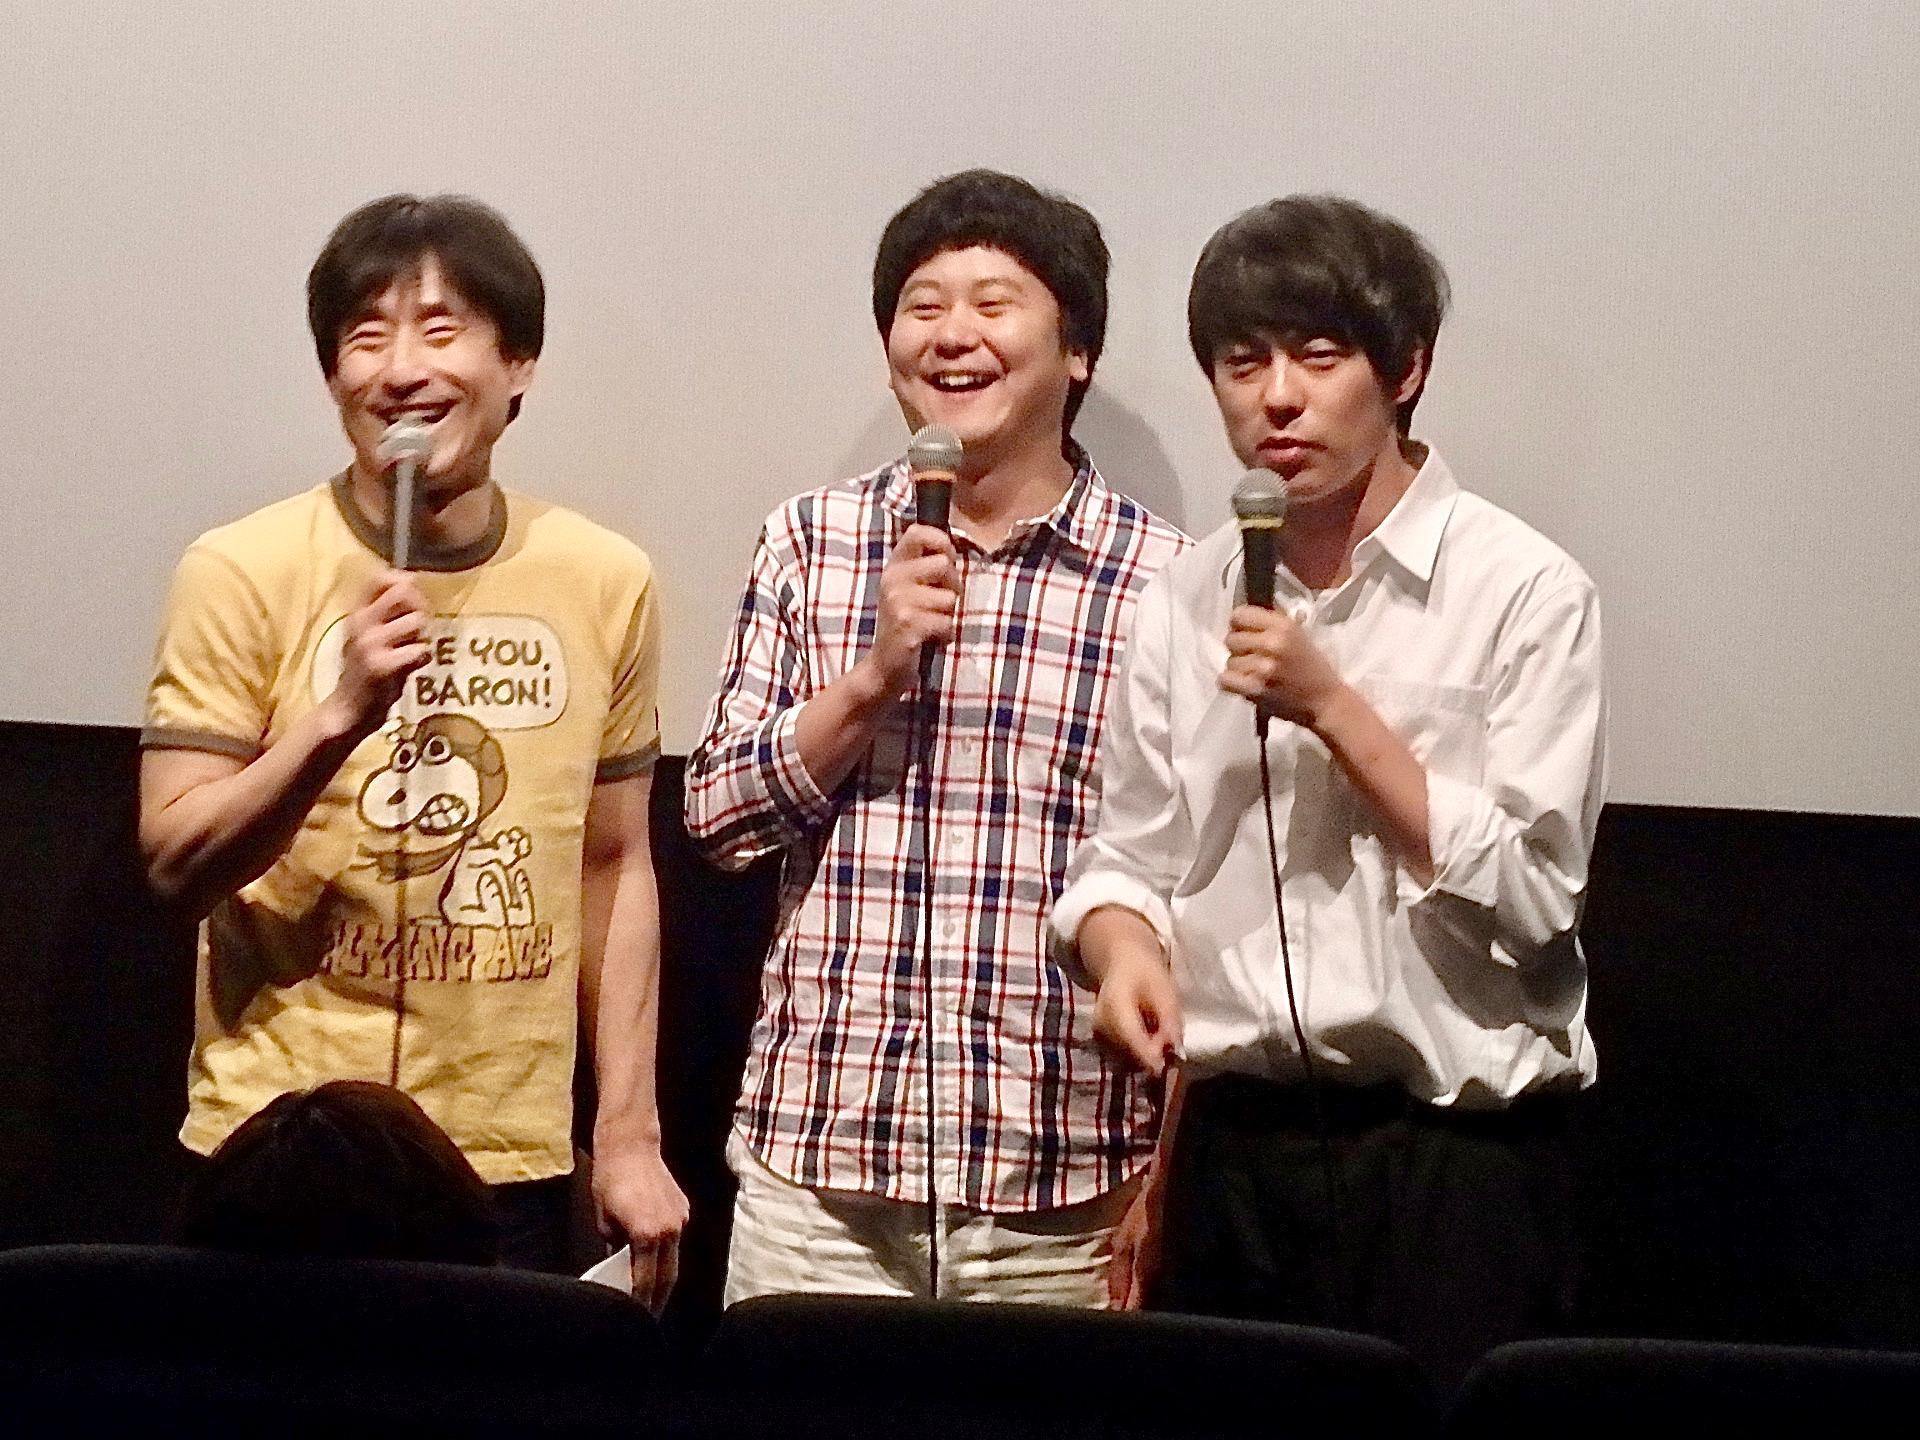 http://news.yoshimoto.co.jp/20171006133024-0174fcd02b74acf97d7de4e5a35d8c5b934cb652.jpg